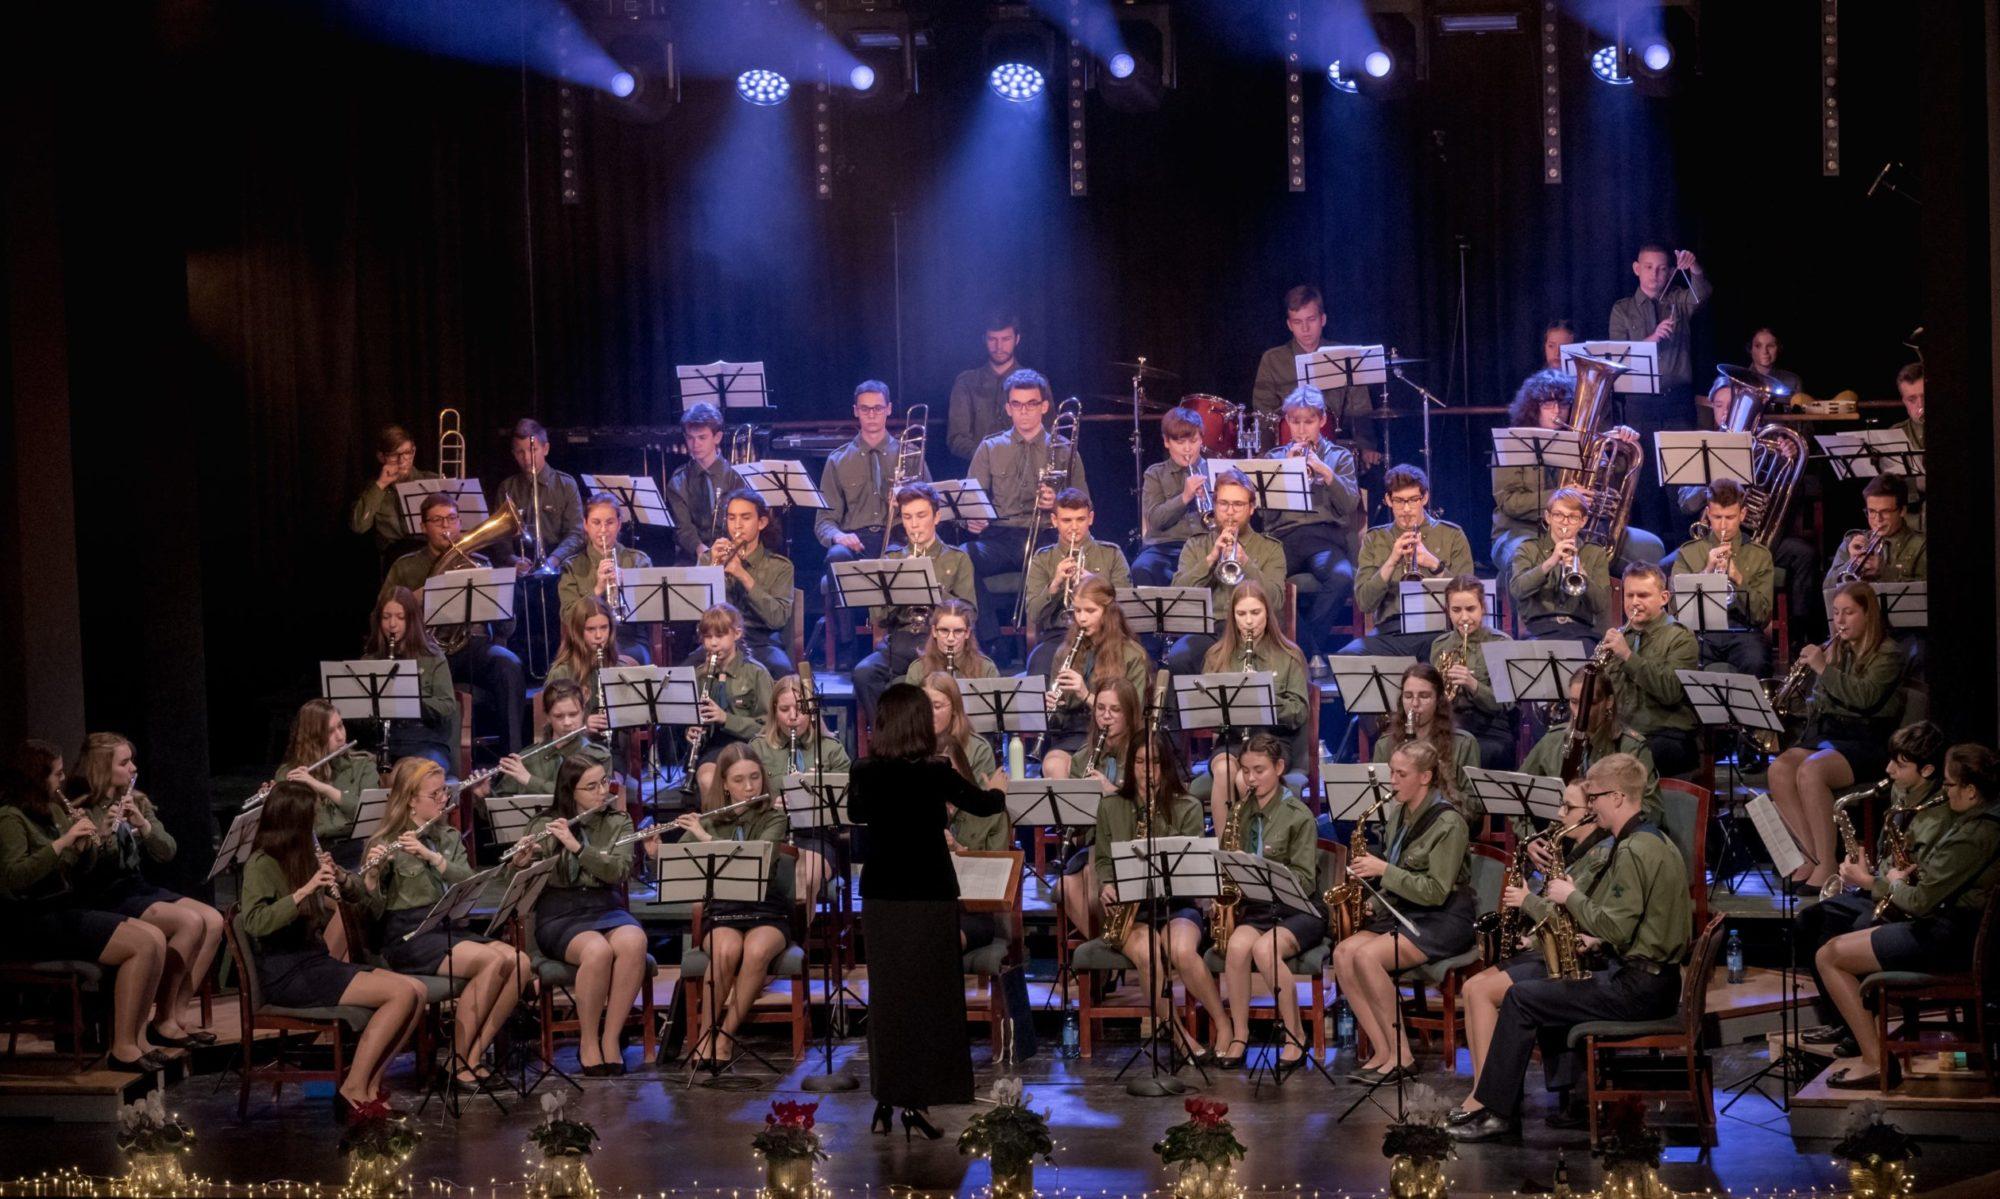 Harcerska Orkiestra Dęta - Tczew